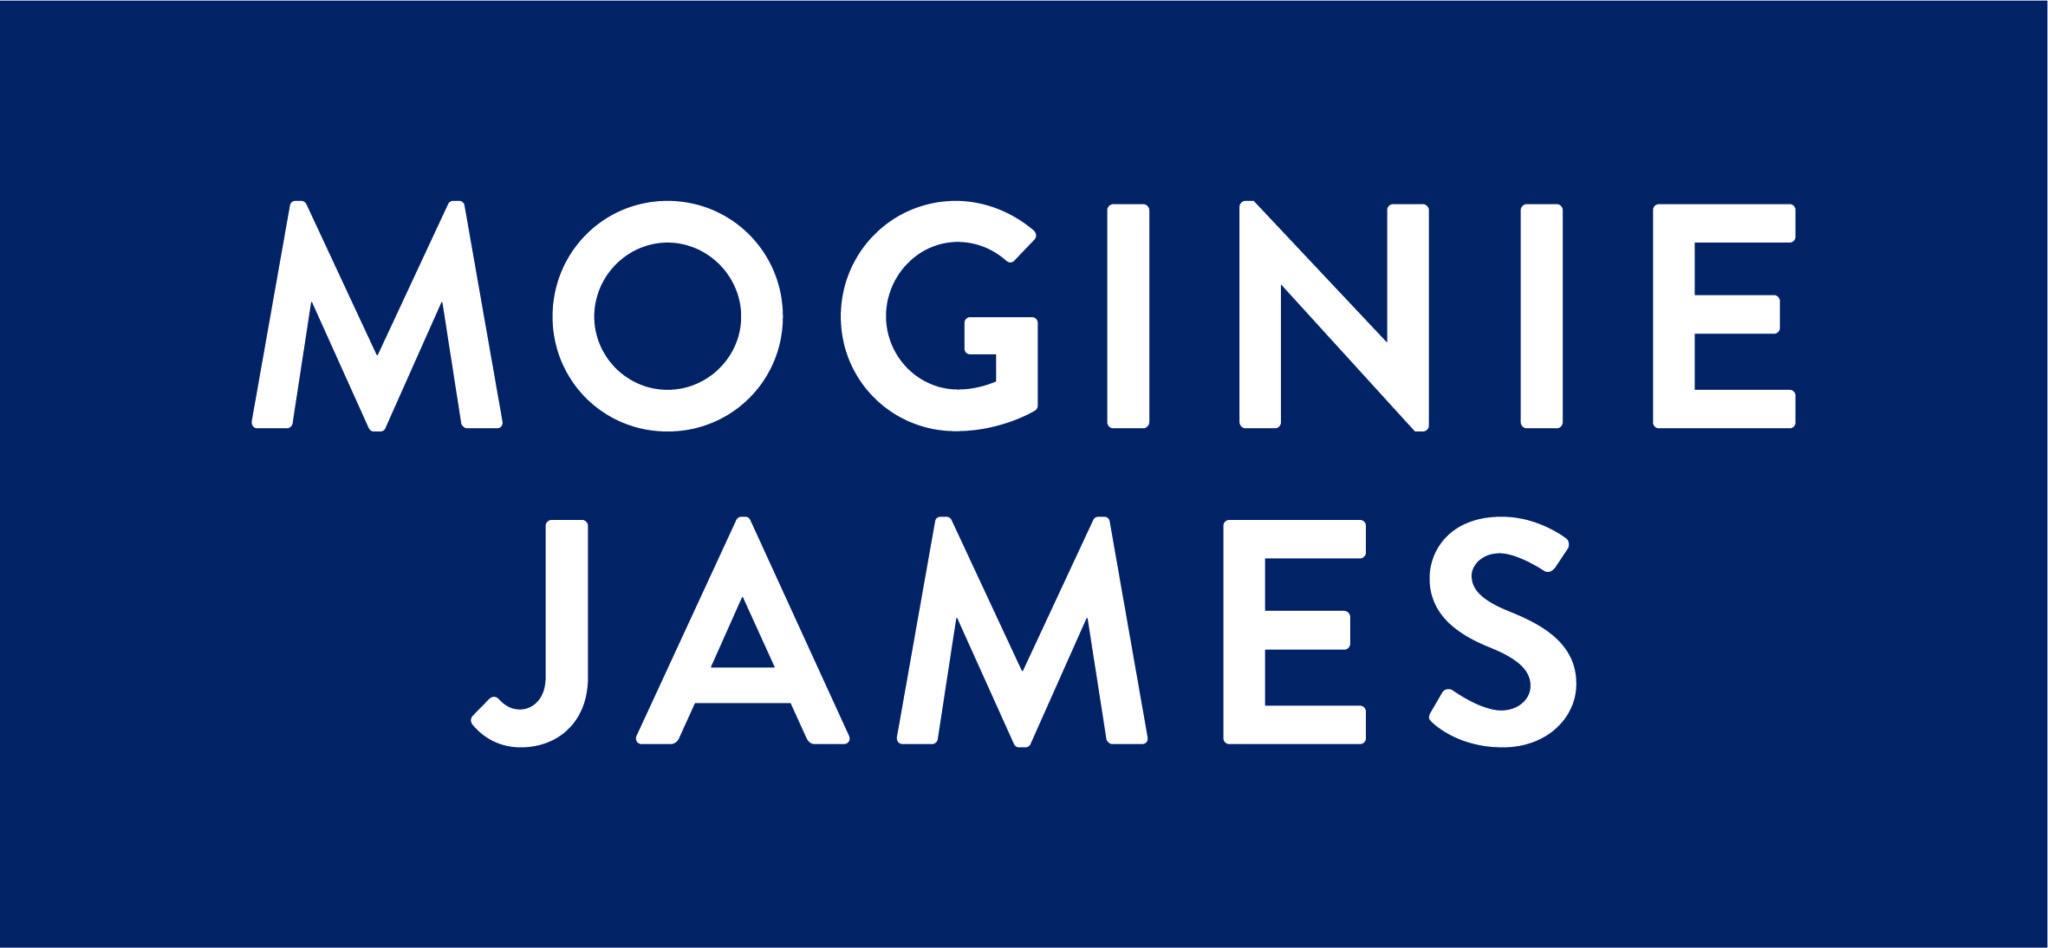 Moginie James